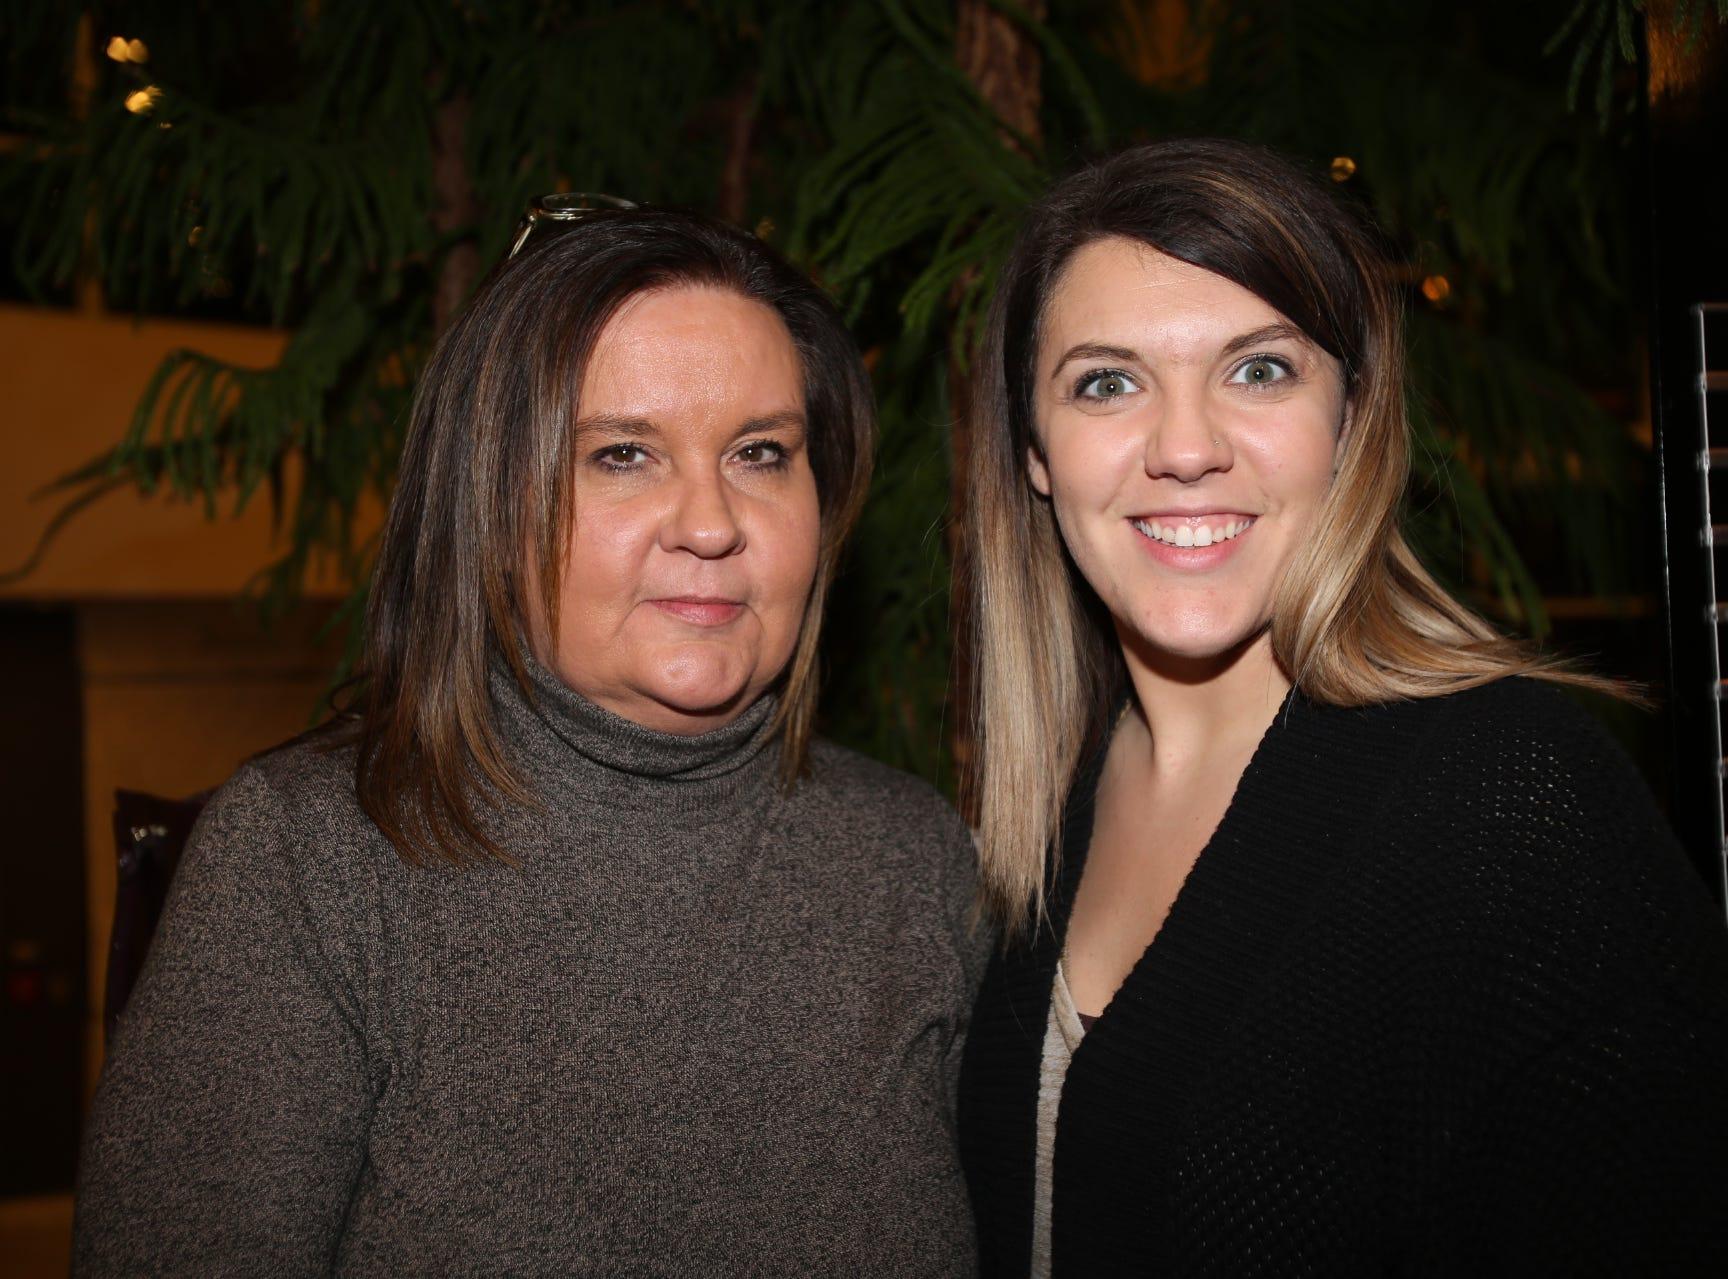 Kelsey Cochran and Cheri Hagler